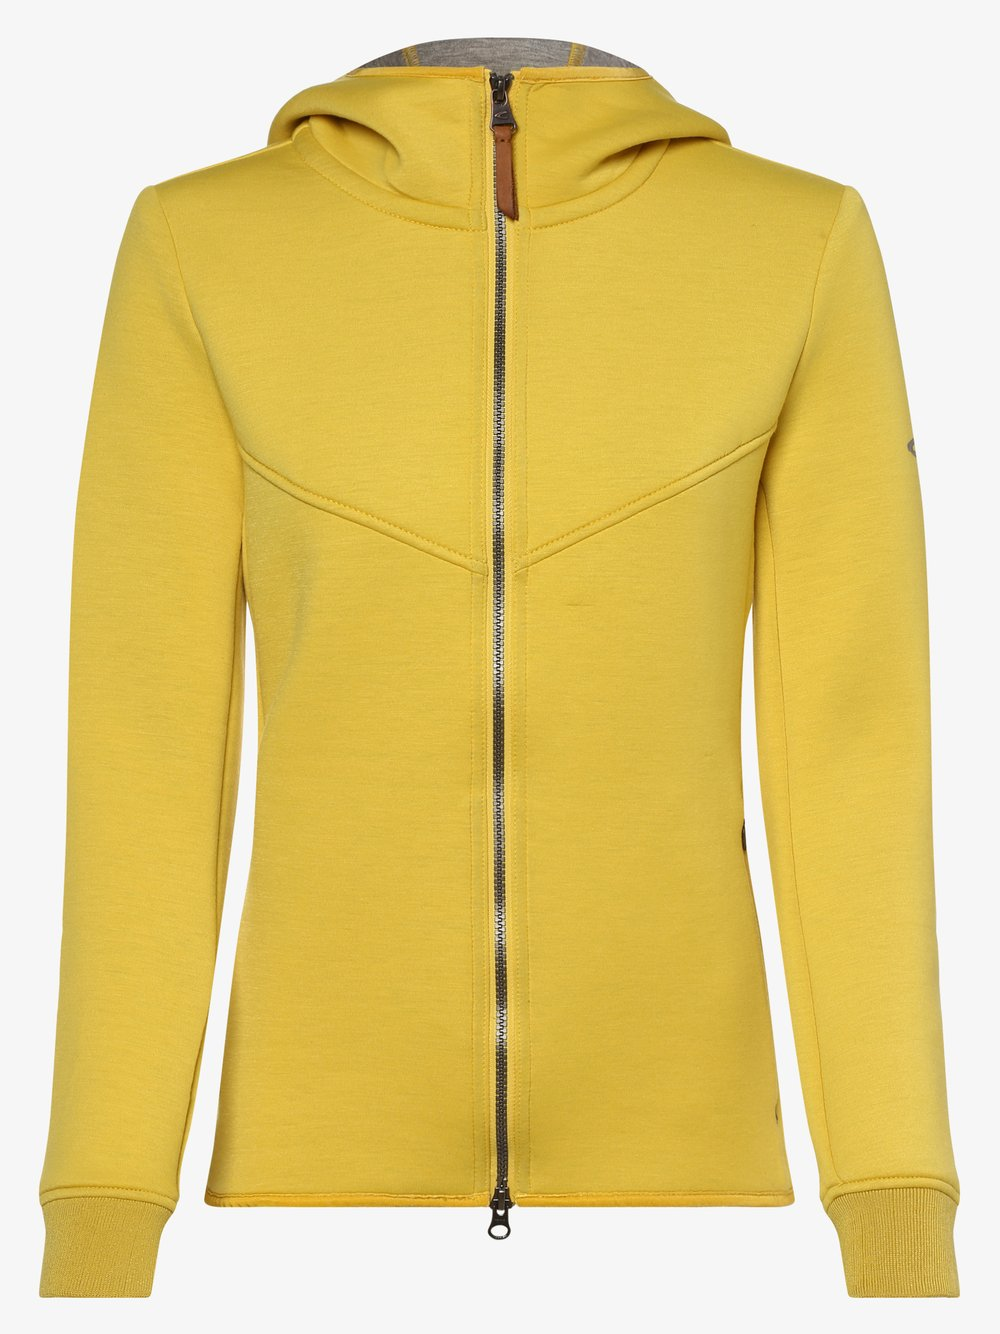 Camel Active - Damska bluza rozpinana, żółty